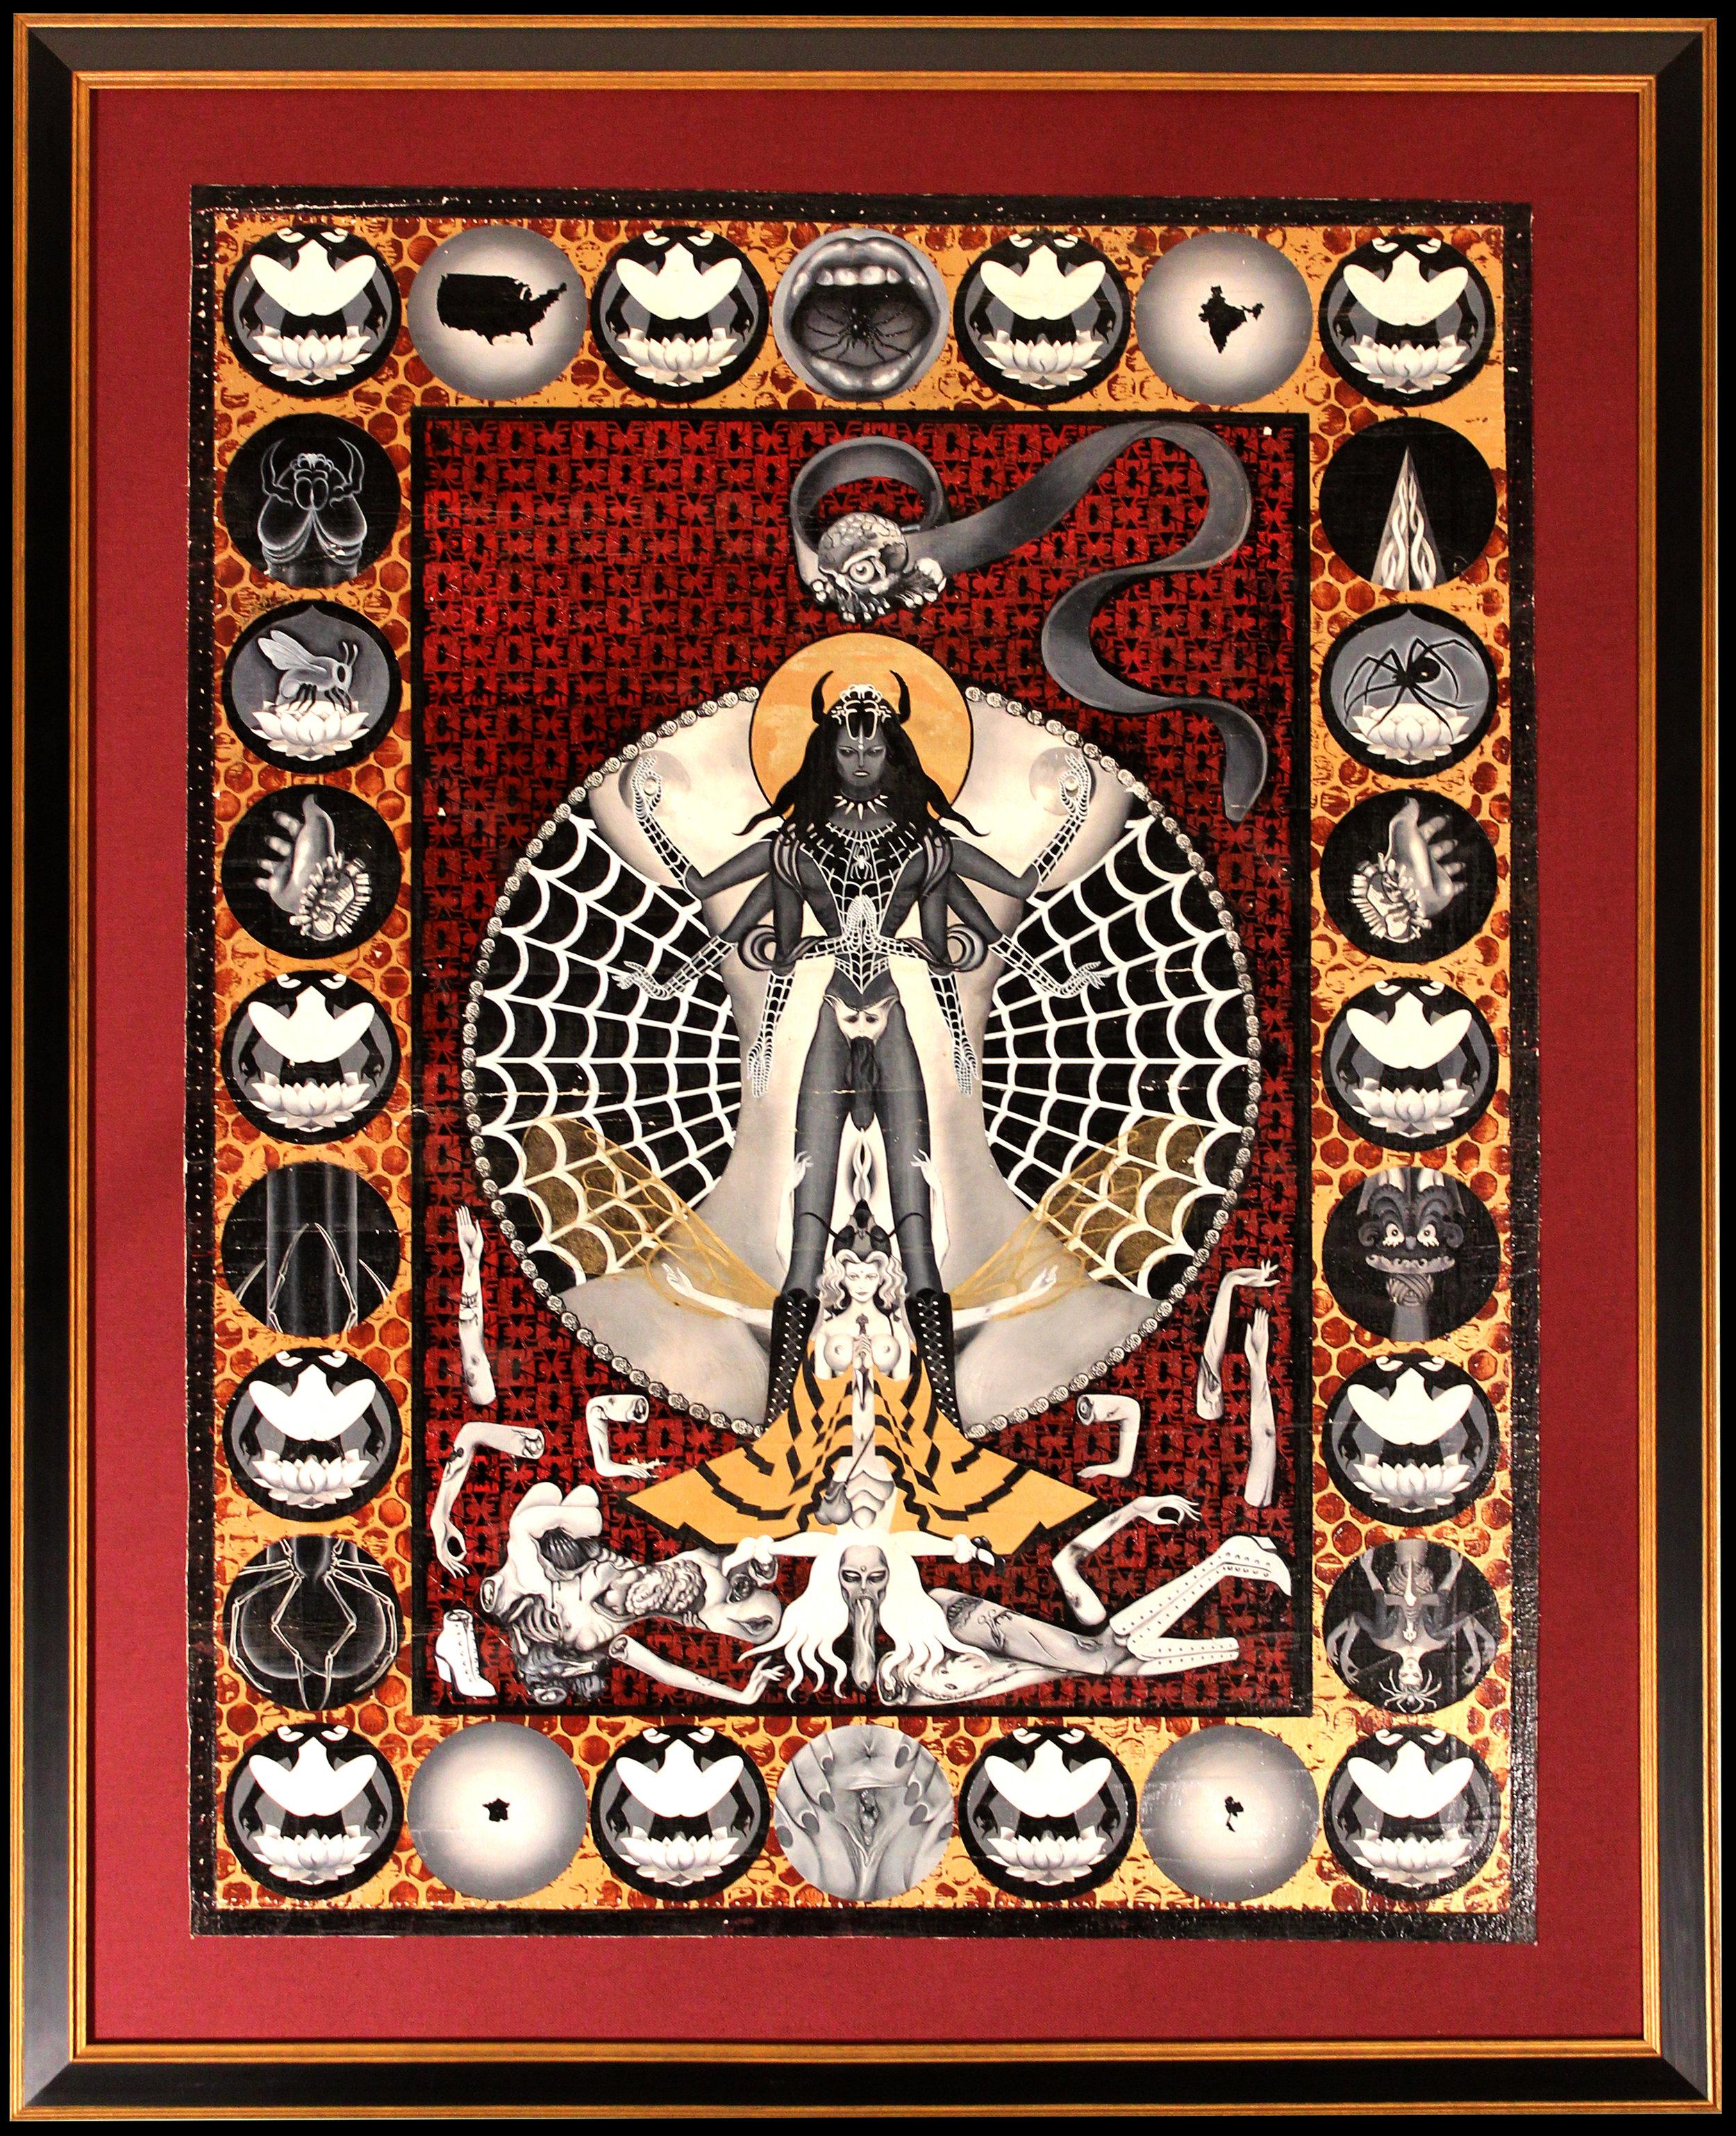 SPIDER-MANDALA 1.jpg